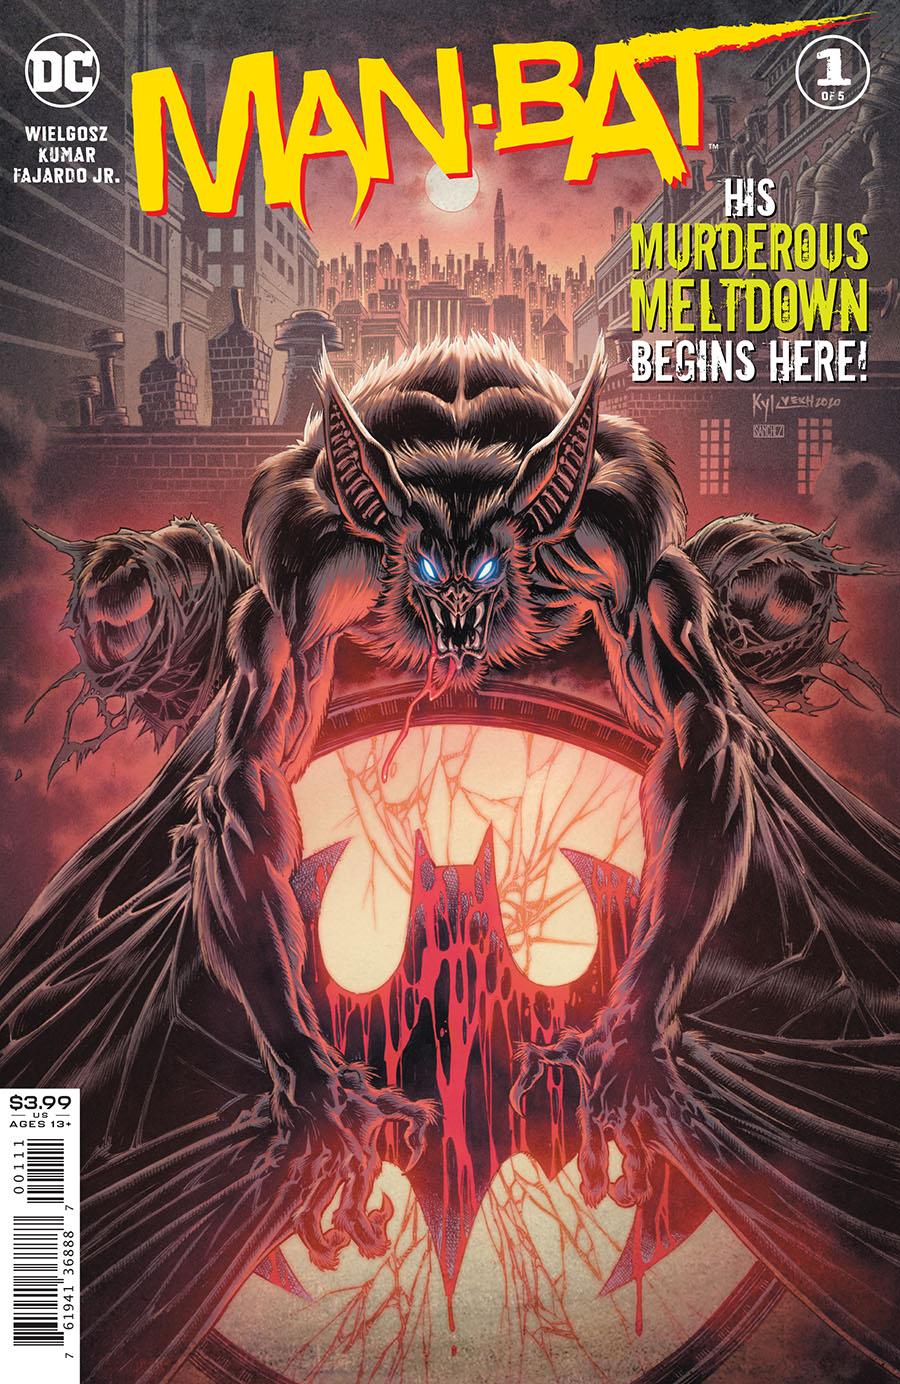 Man-Bat Vol 4 #1 Cover A Regular Kyle Hotz Cover